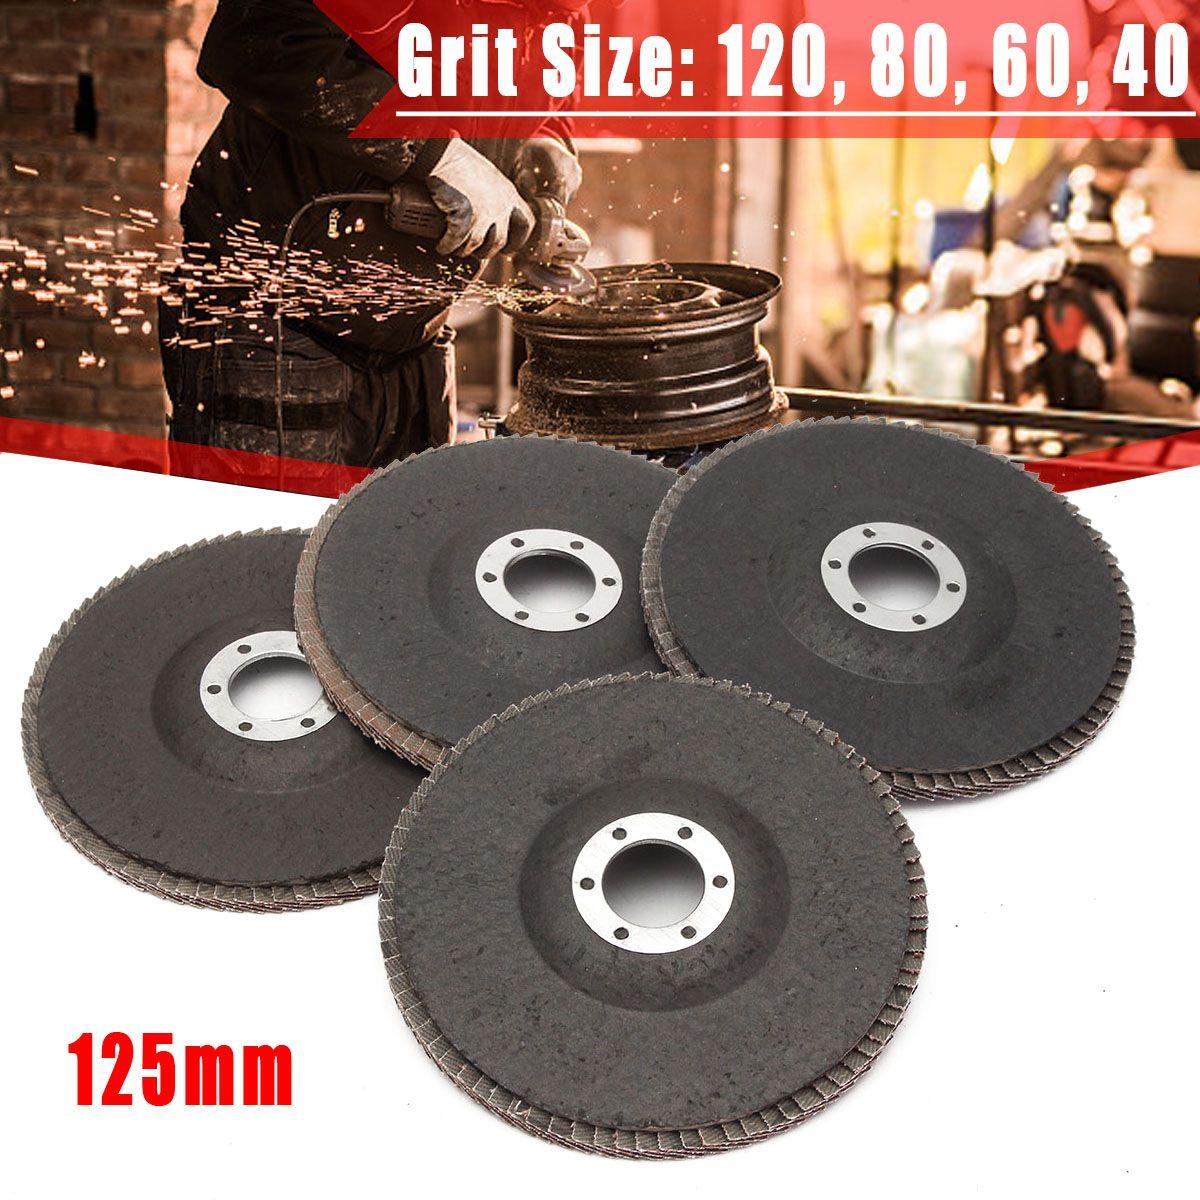 40/60/80/120 Grit Grinding Wheel Flap Disc 125mm 5 Inch Angle Grinder Sanding Tool 13000 Rpm Aluminum Oxide Abrasive Tools